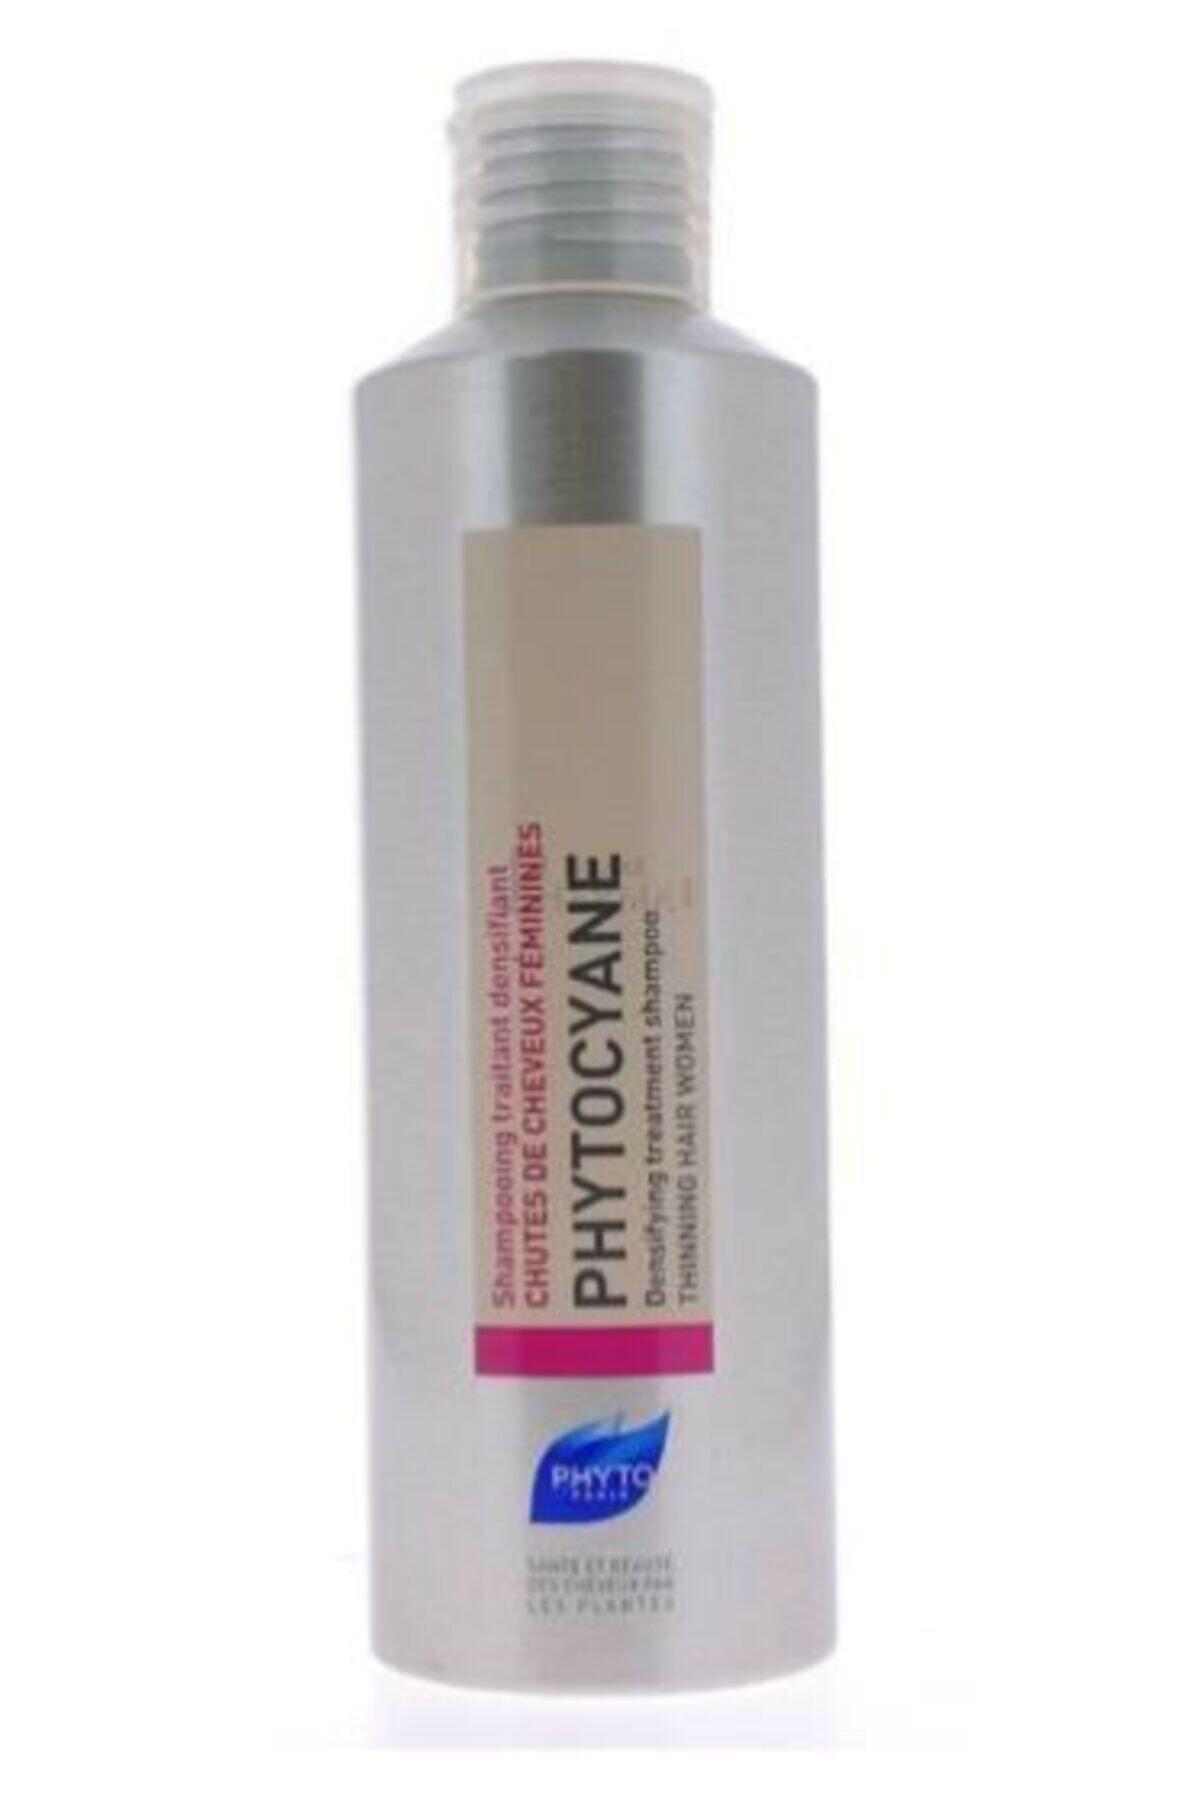 Phyto Cyane Şampuan 200 ml 1